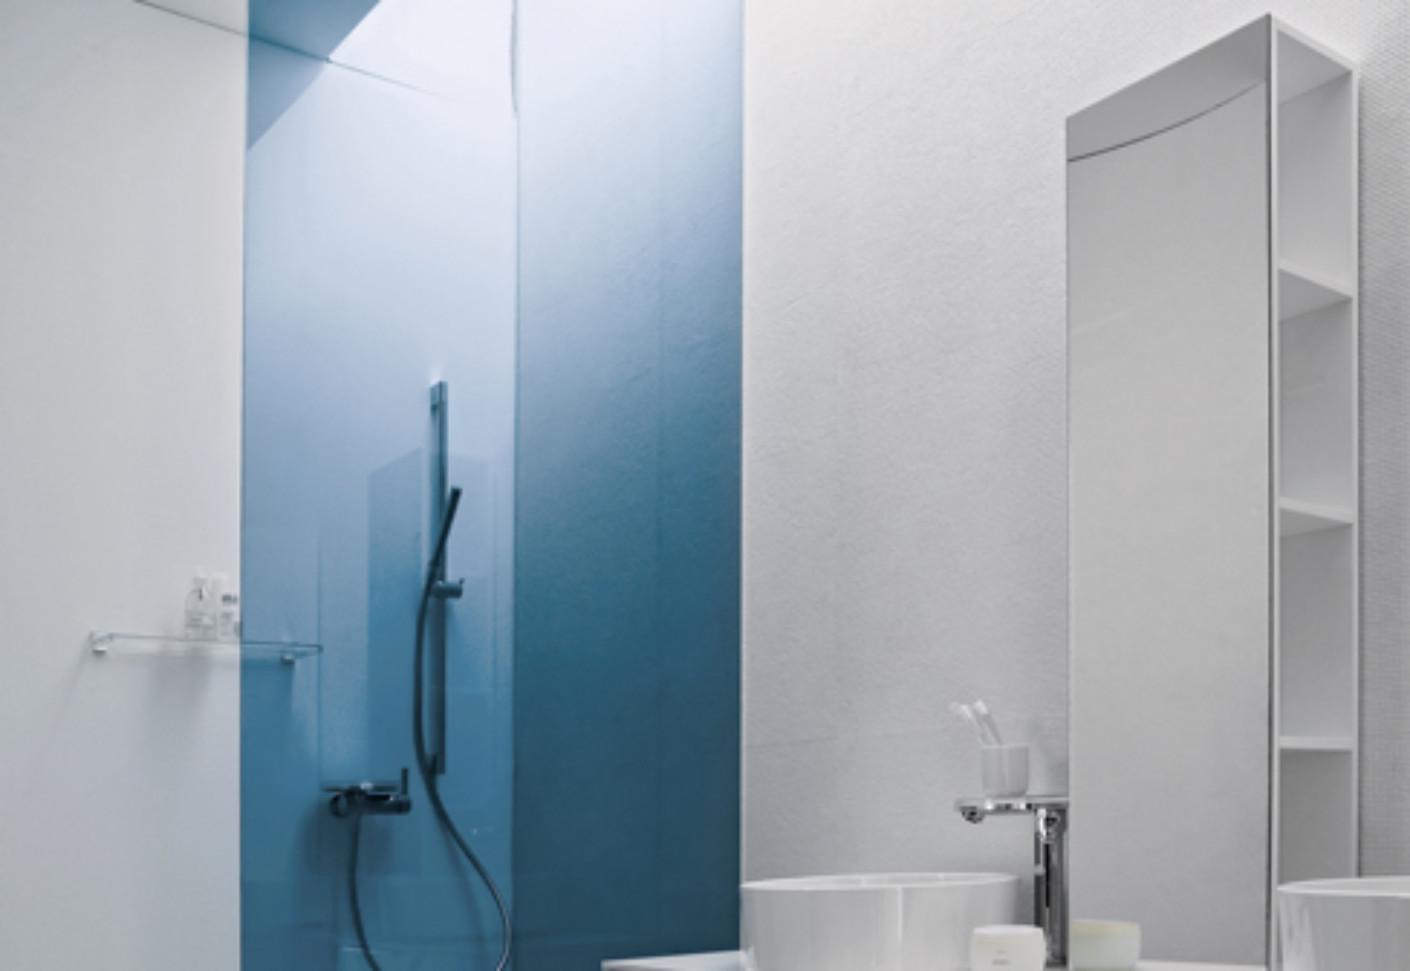 Kartell by Laufen Medium cabinet with mirror front by Laufen | STYLEPARK